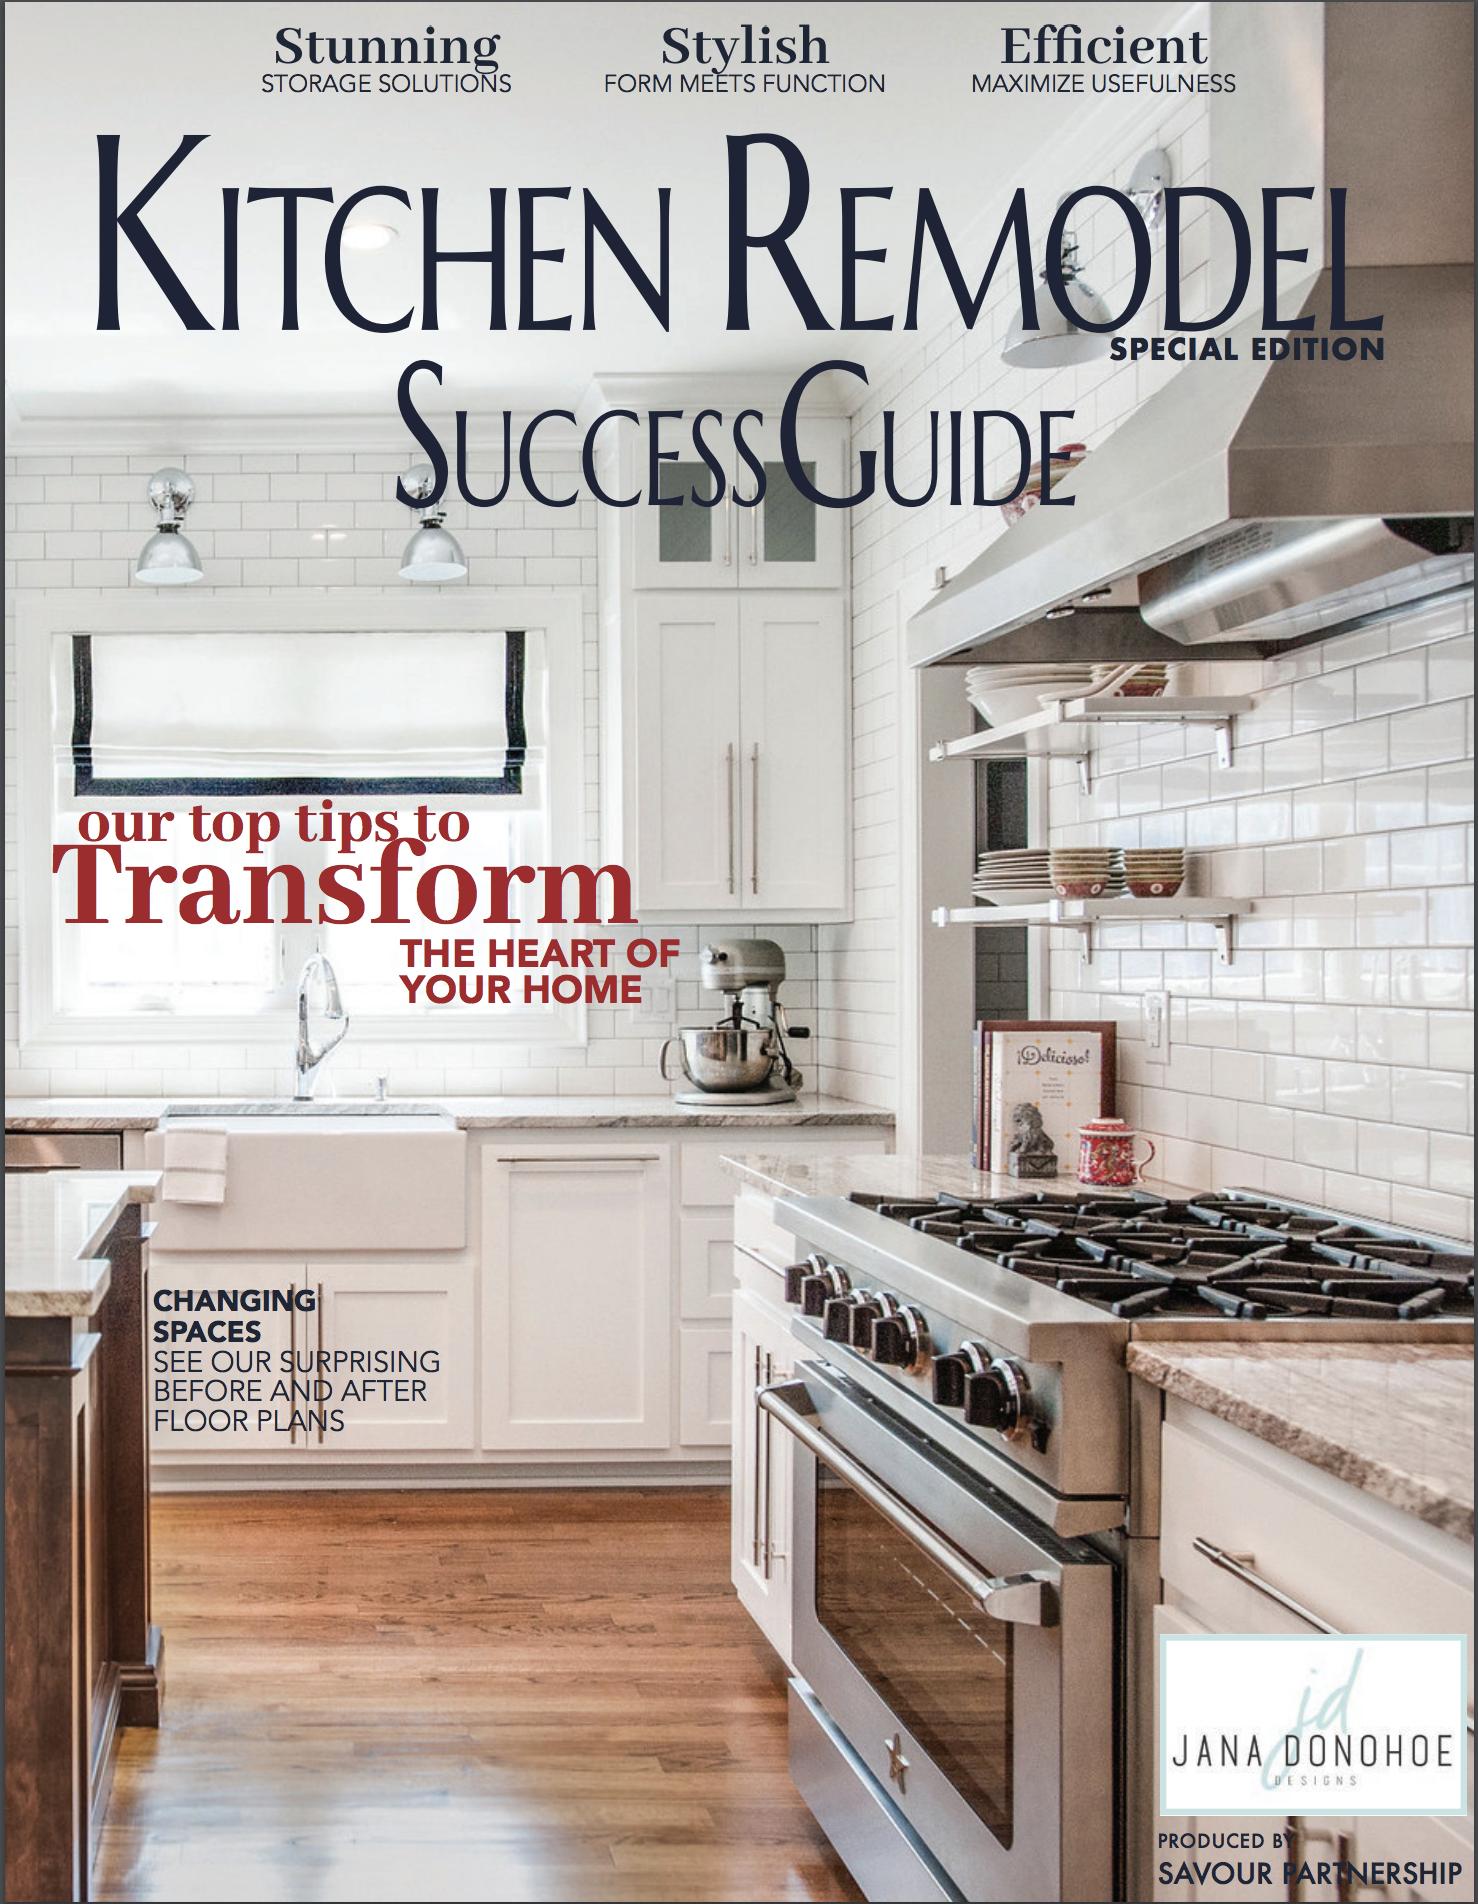 Top Tips For Kitchen Remodeling_JanaDonohoeDesigns_www.janadonohoedesigns.com_Fayetteville, North Carolina